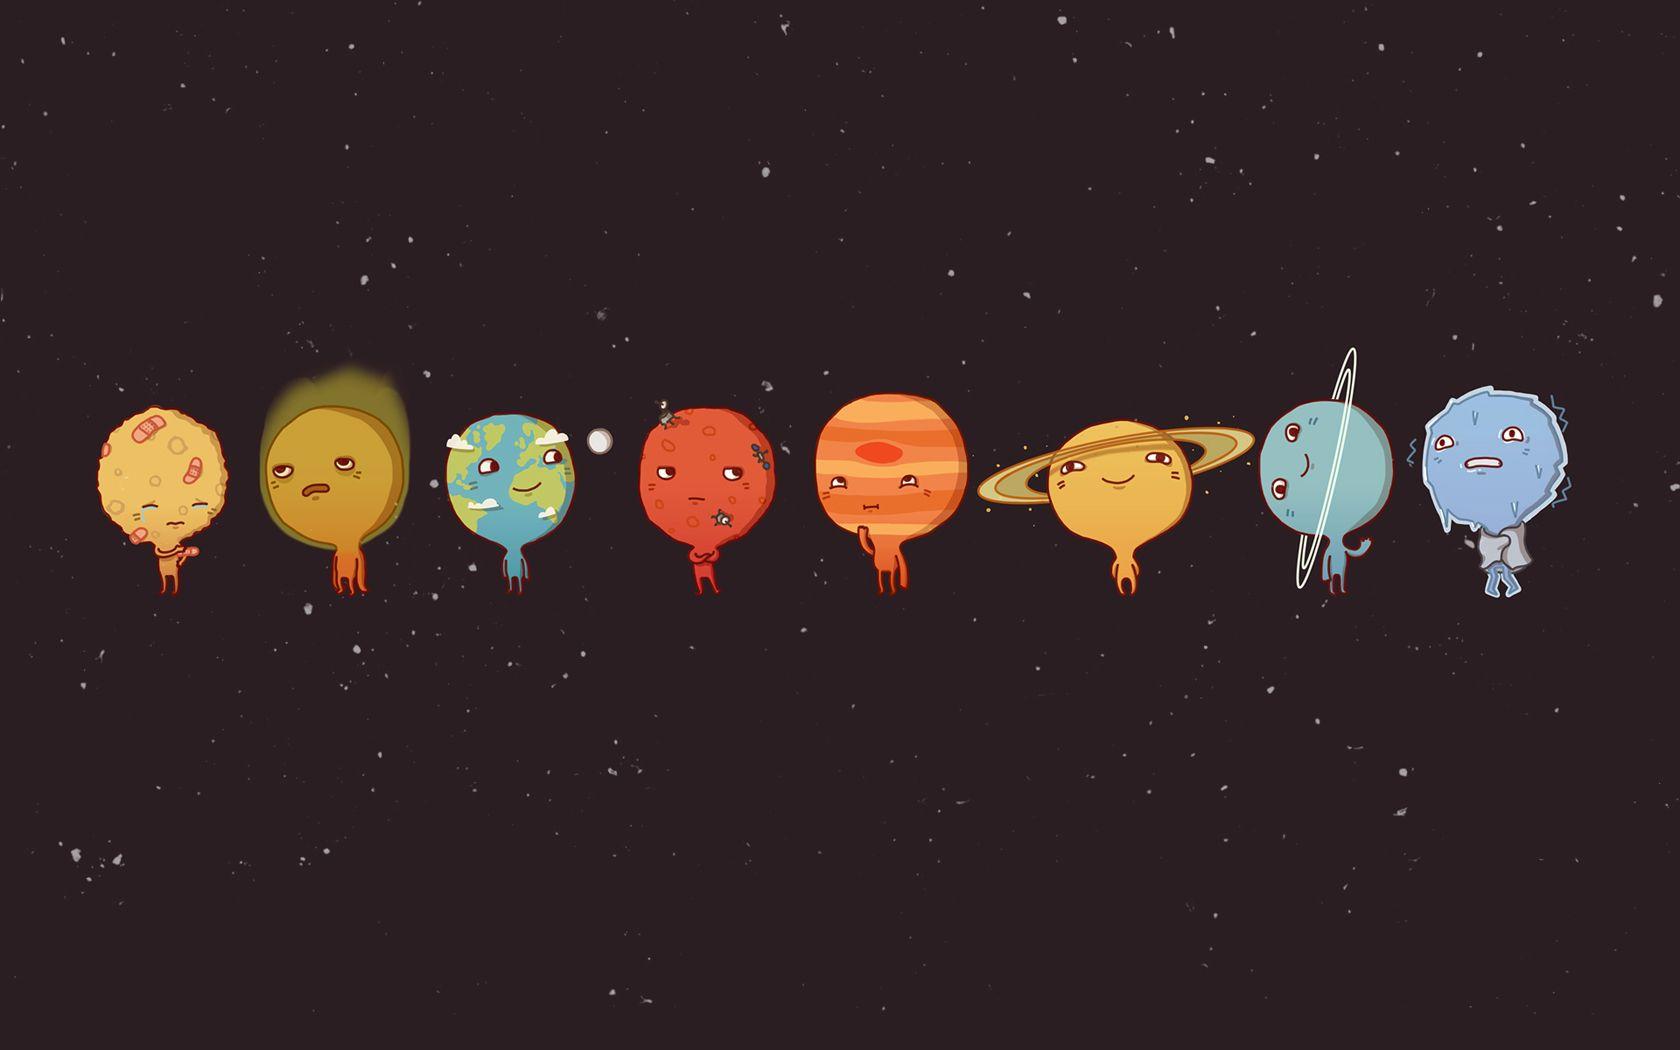 Minimalistic Solar System Planets Little Wallpaper 254065 Wallbase Cc Desktop Wallpapers Tumblr Planets Wallpaper Planets Art